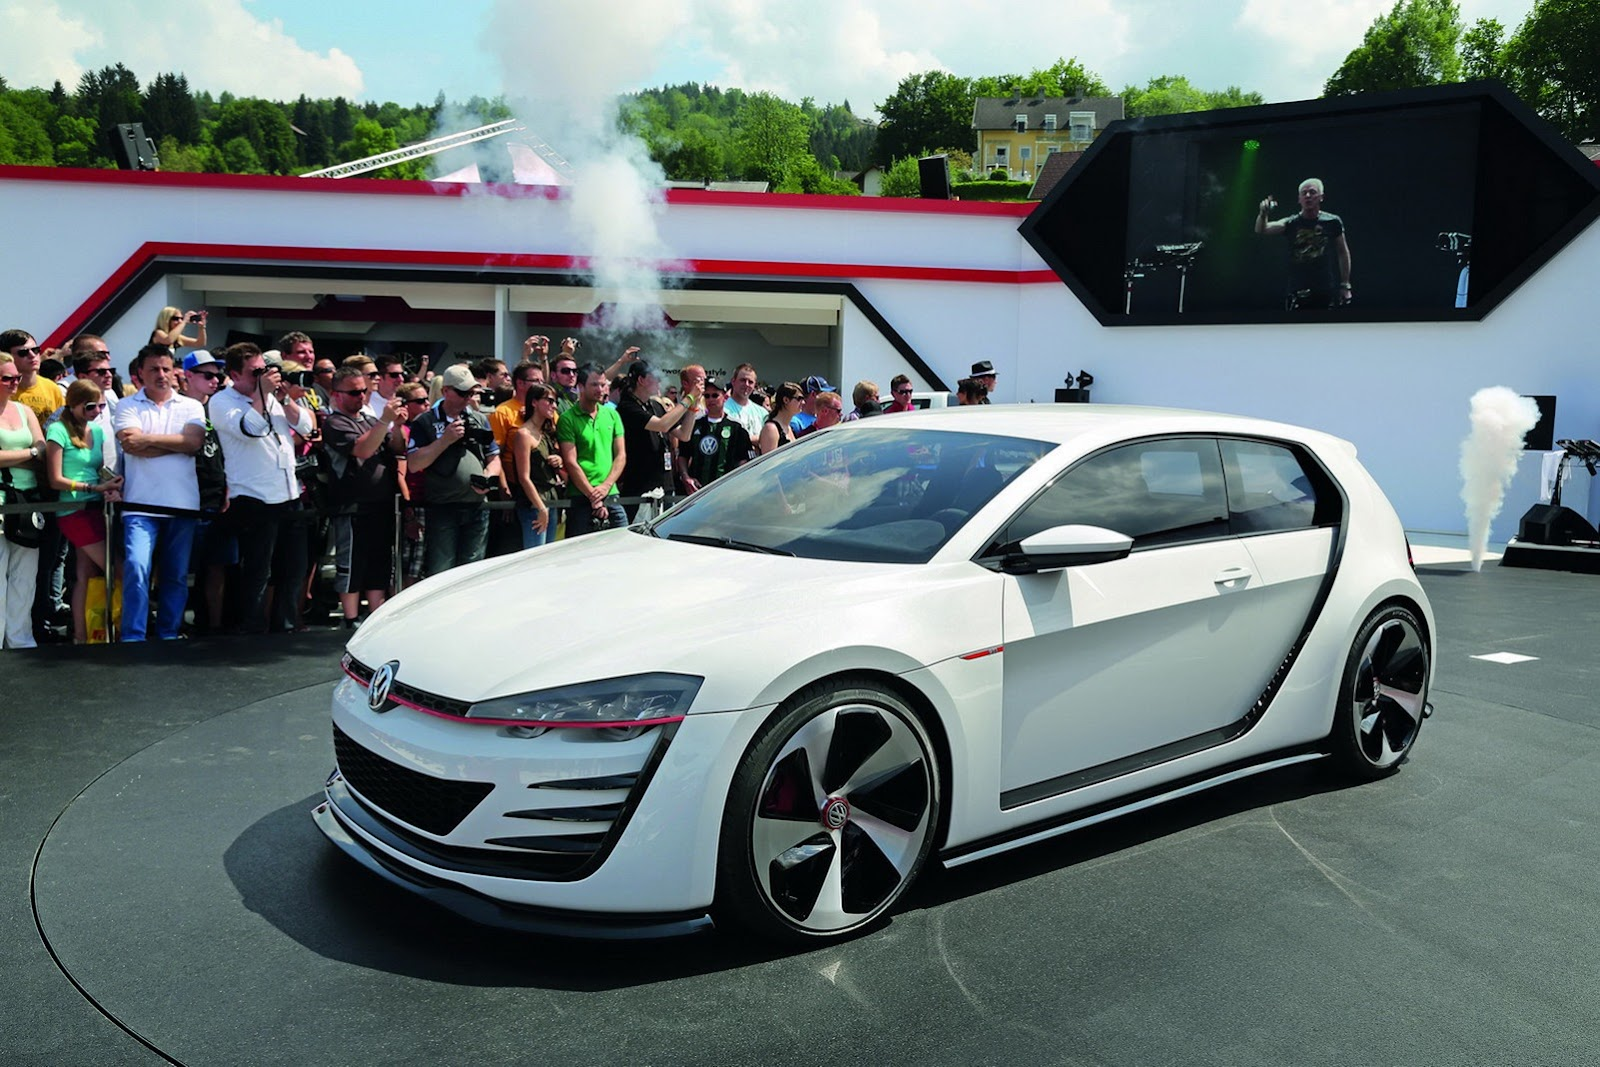 VW-Design-Vision-GTI-1%25255B2%25255D.jpg